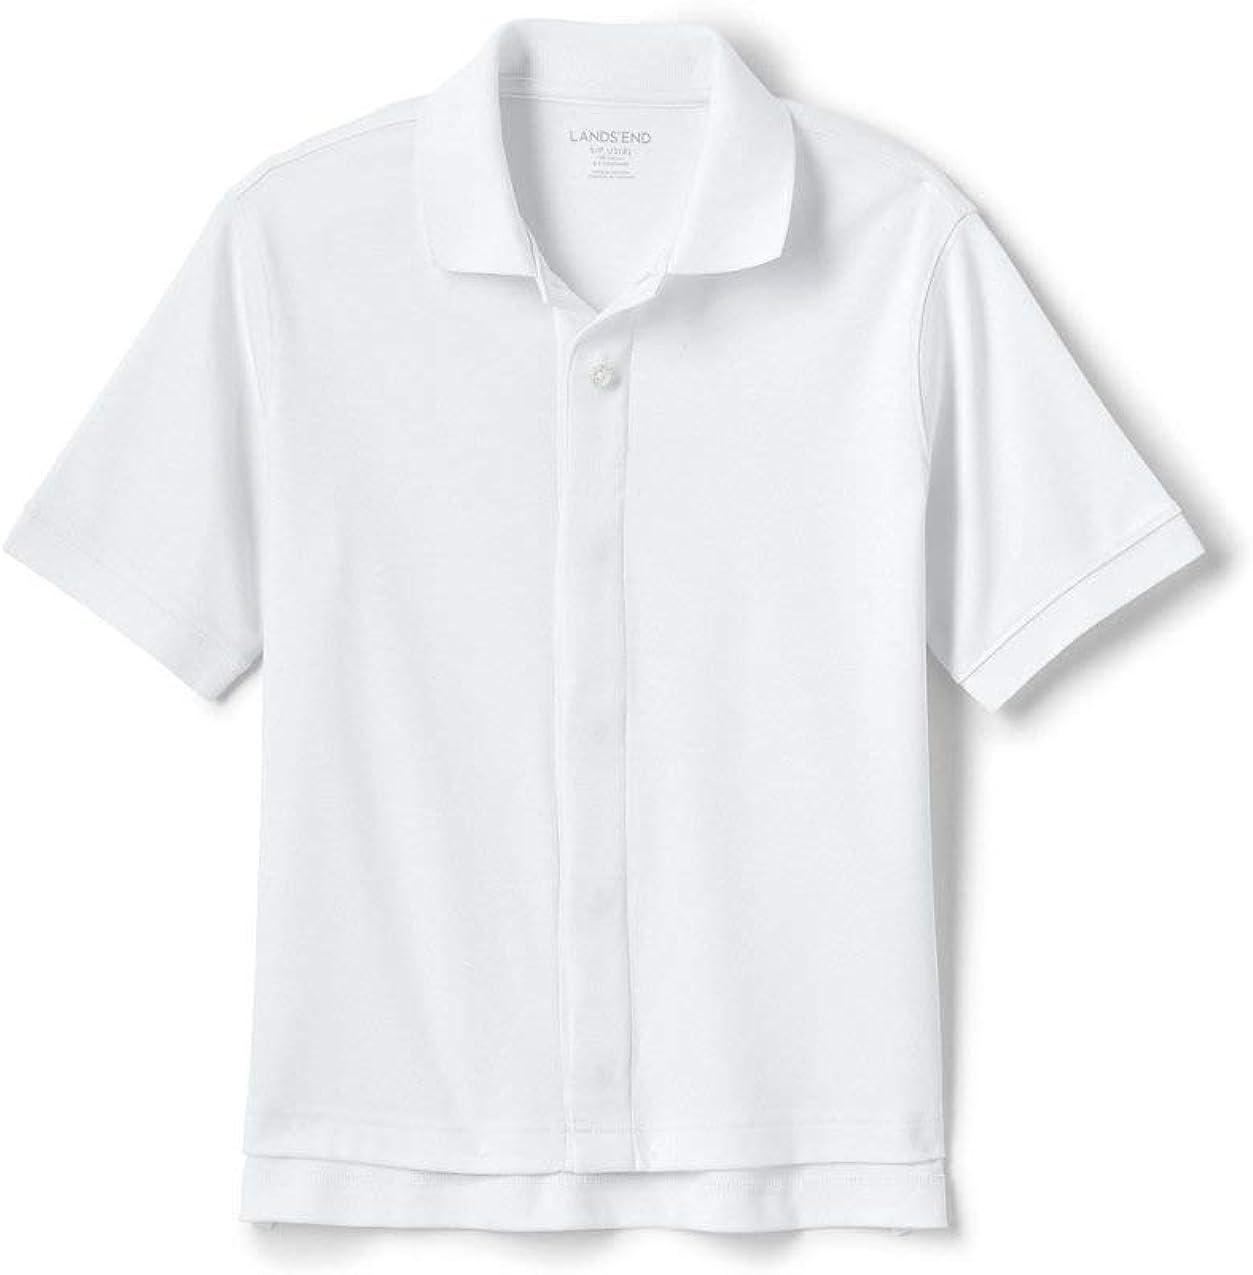 Lands' End School Uniform Little Kids Adaptive Short Sleeve Interlock Polo Shirt